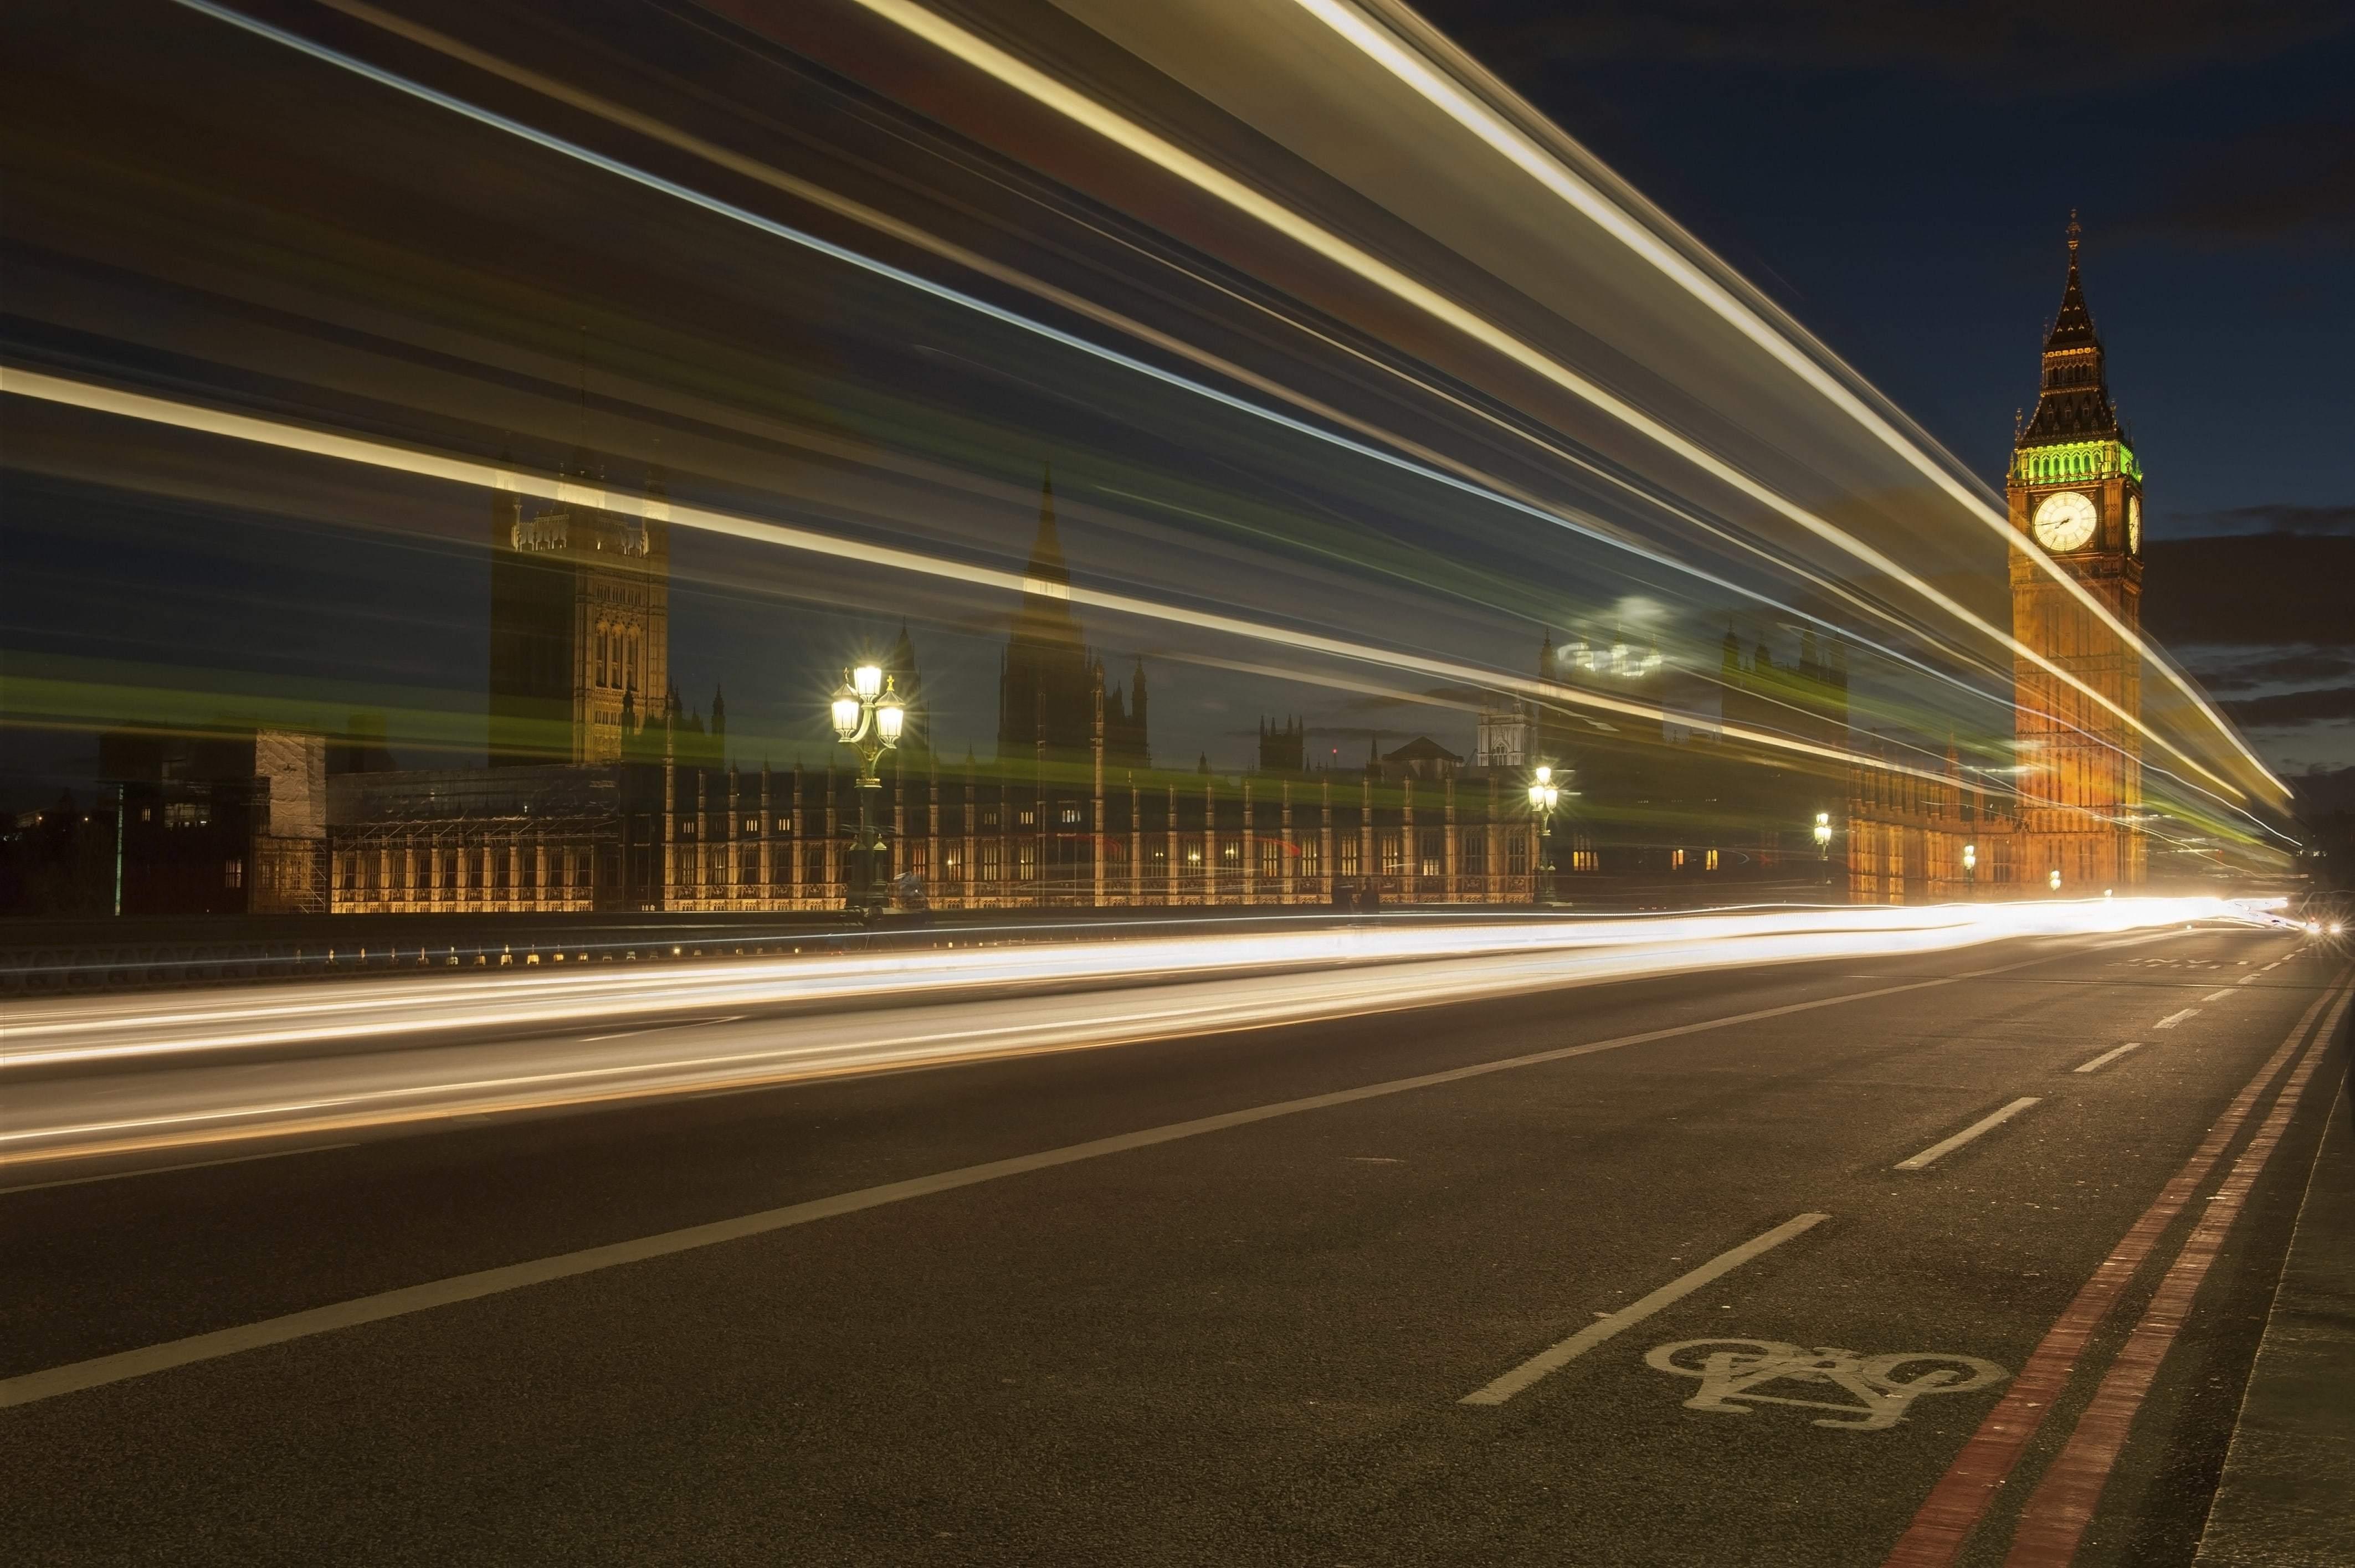 Light trails photo in Central London, Big Ben